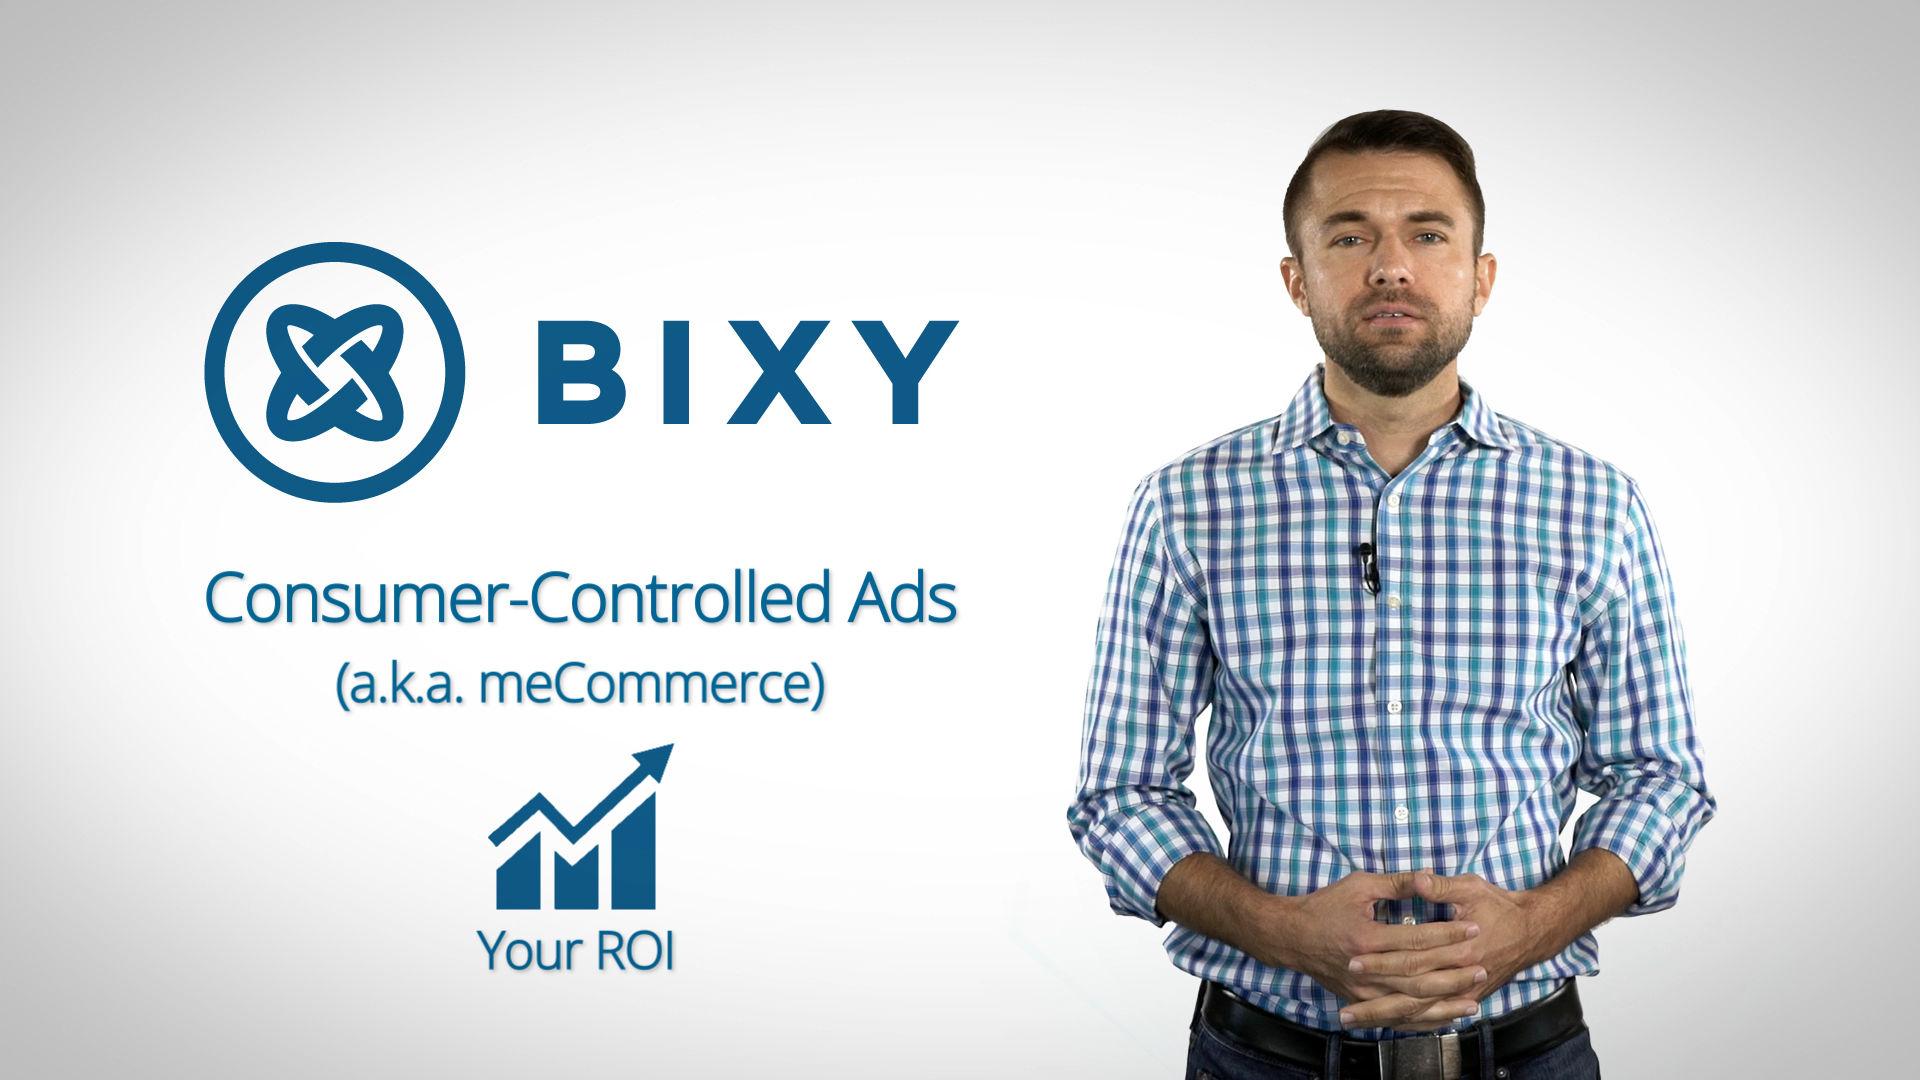 Bixy: Business ROI